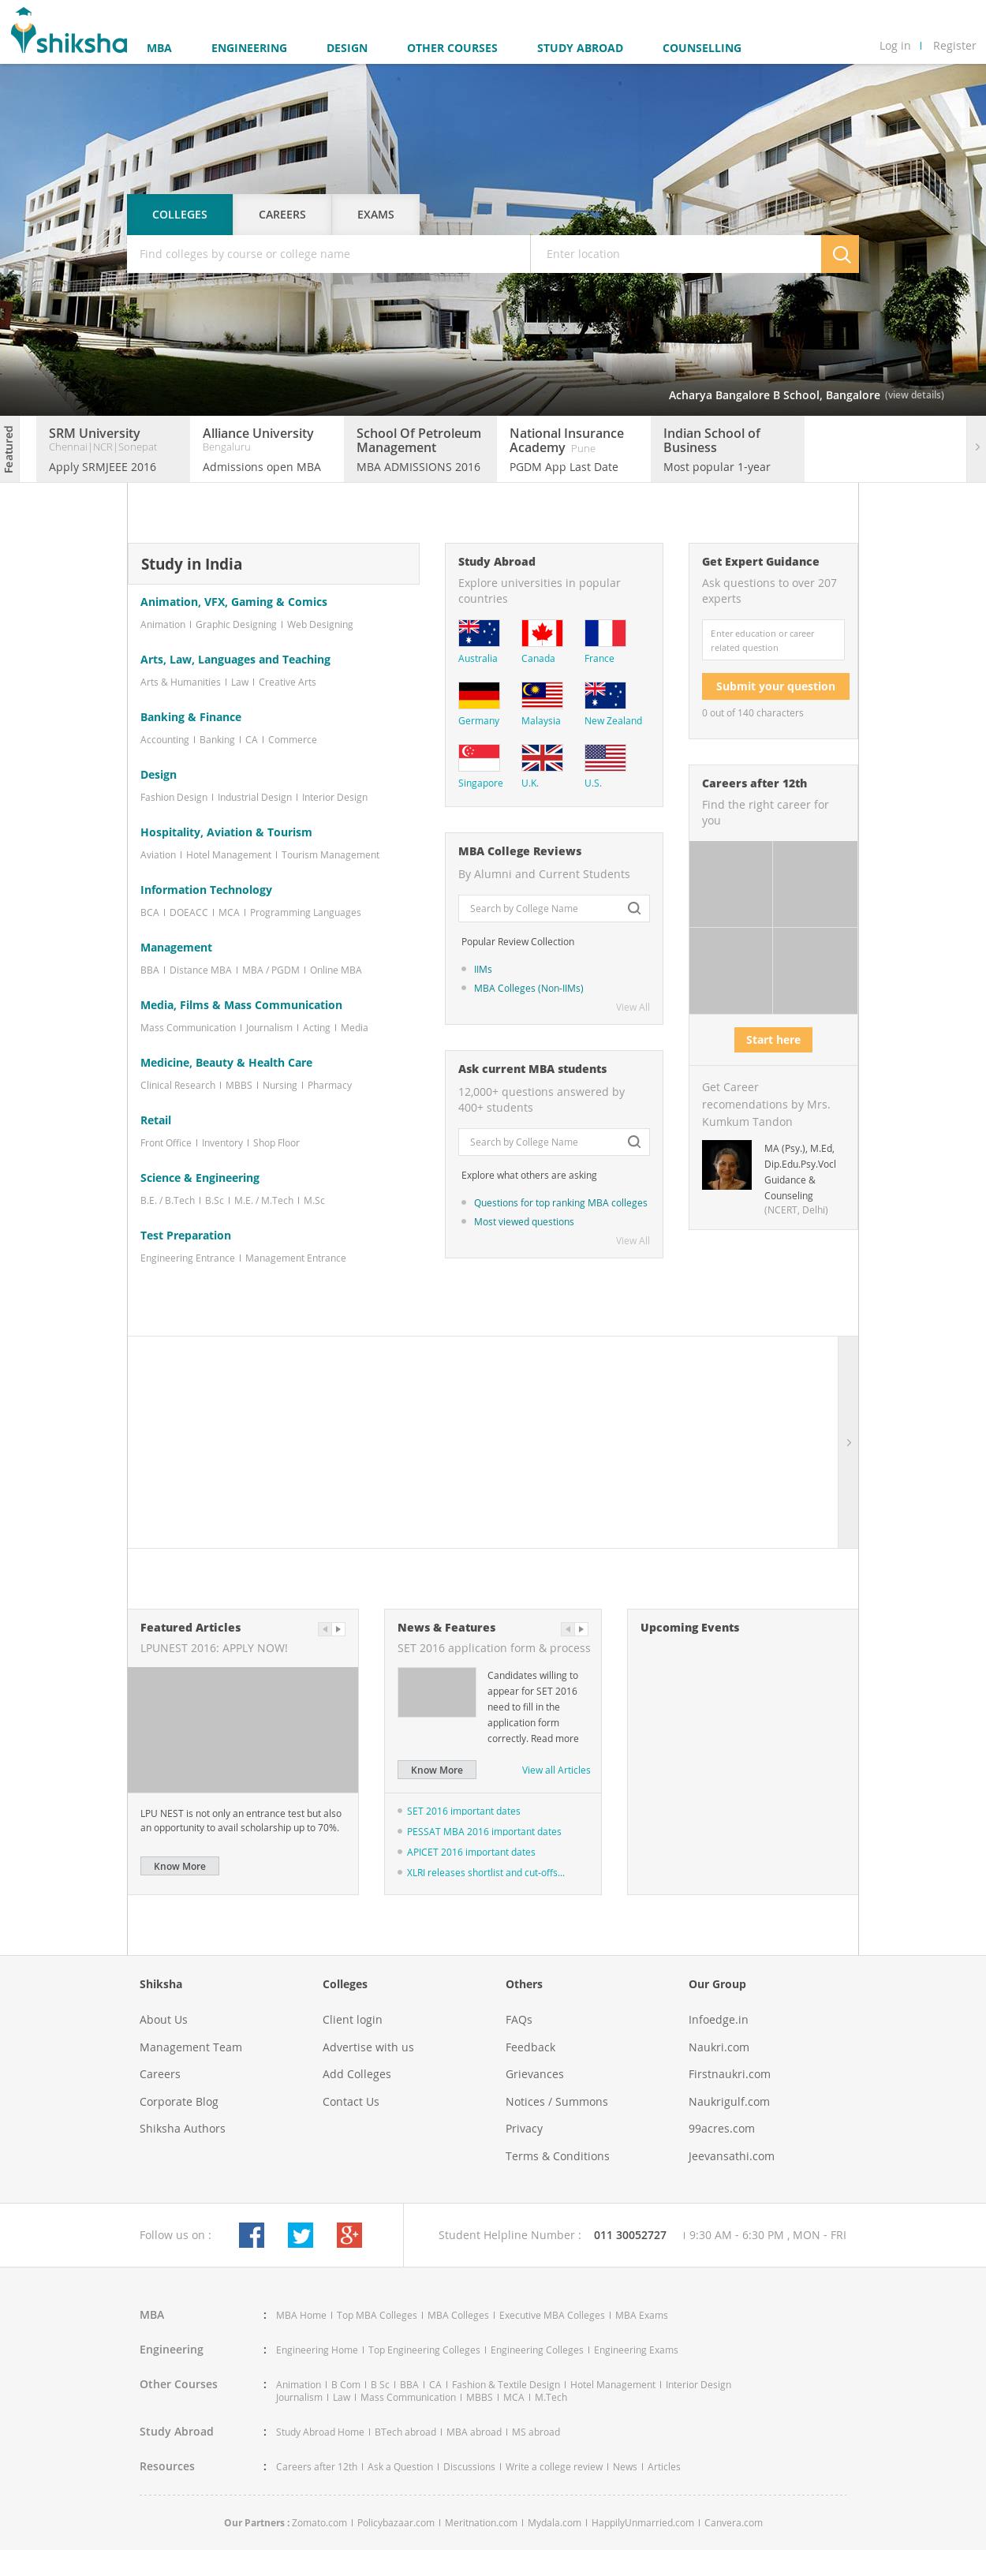 Shiksha Competitors, Revenue and Employees - Owler Company Profile